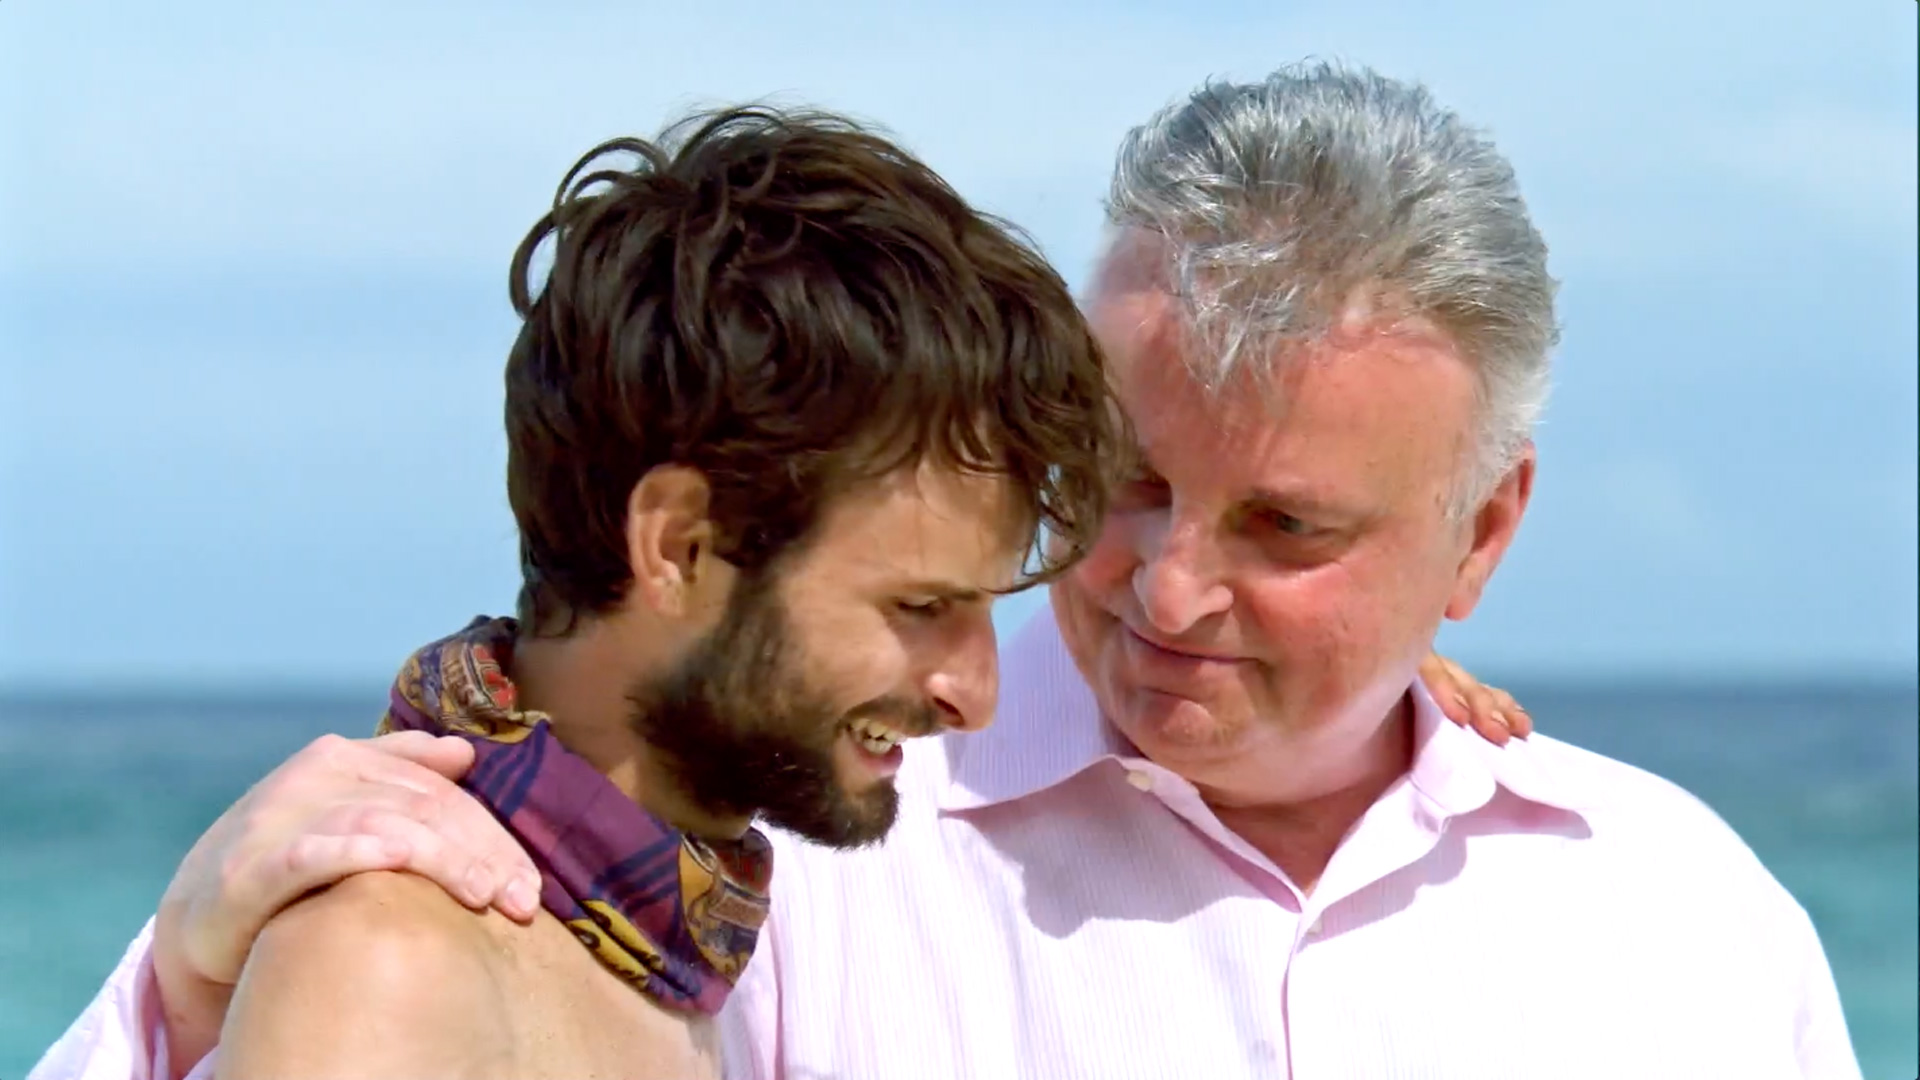 Season 35: Ryan Ulrich reunites with his father.